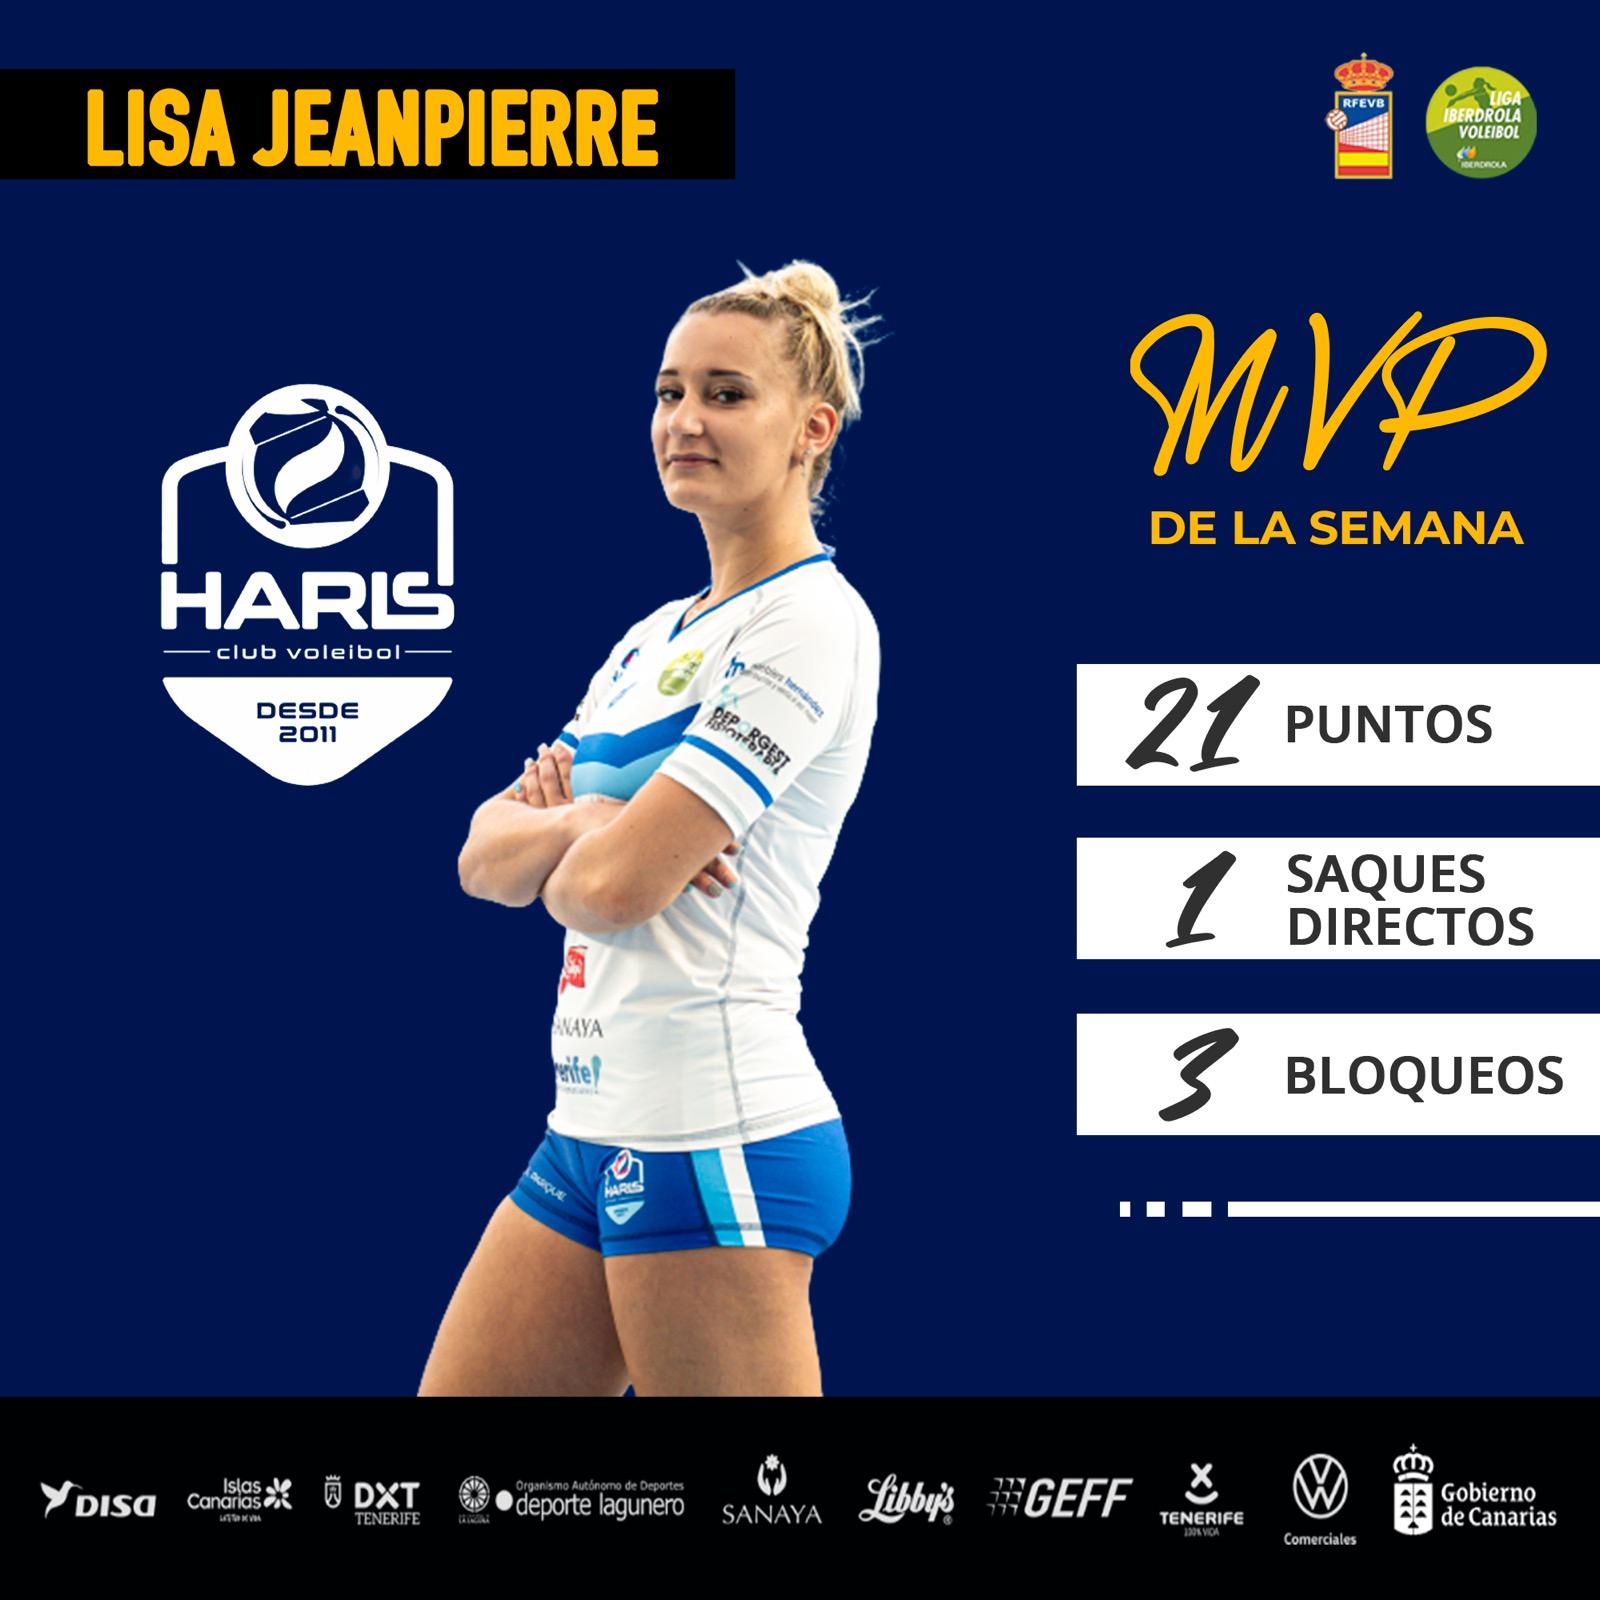 La jugadora del CV Haris, Lisa Jeanpierre, la mejor de la jornada de la Liga Iberdrola